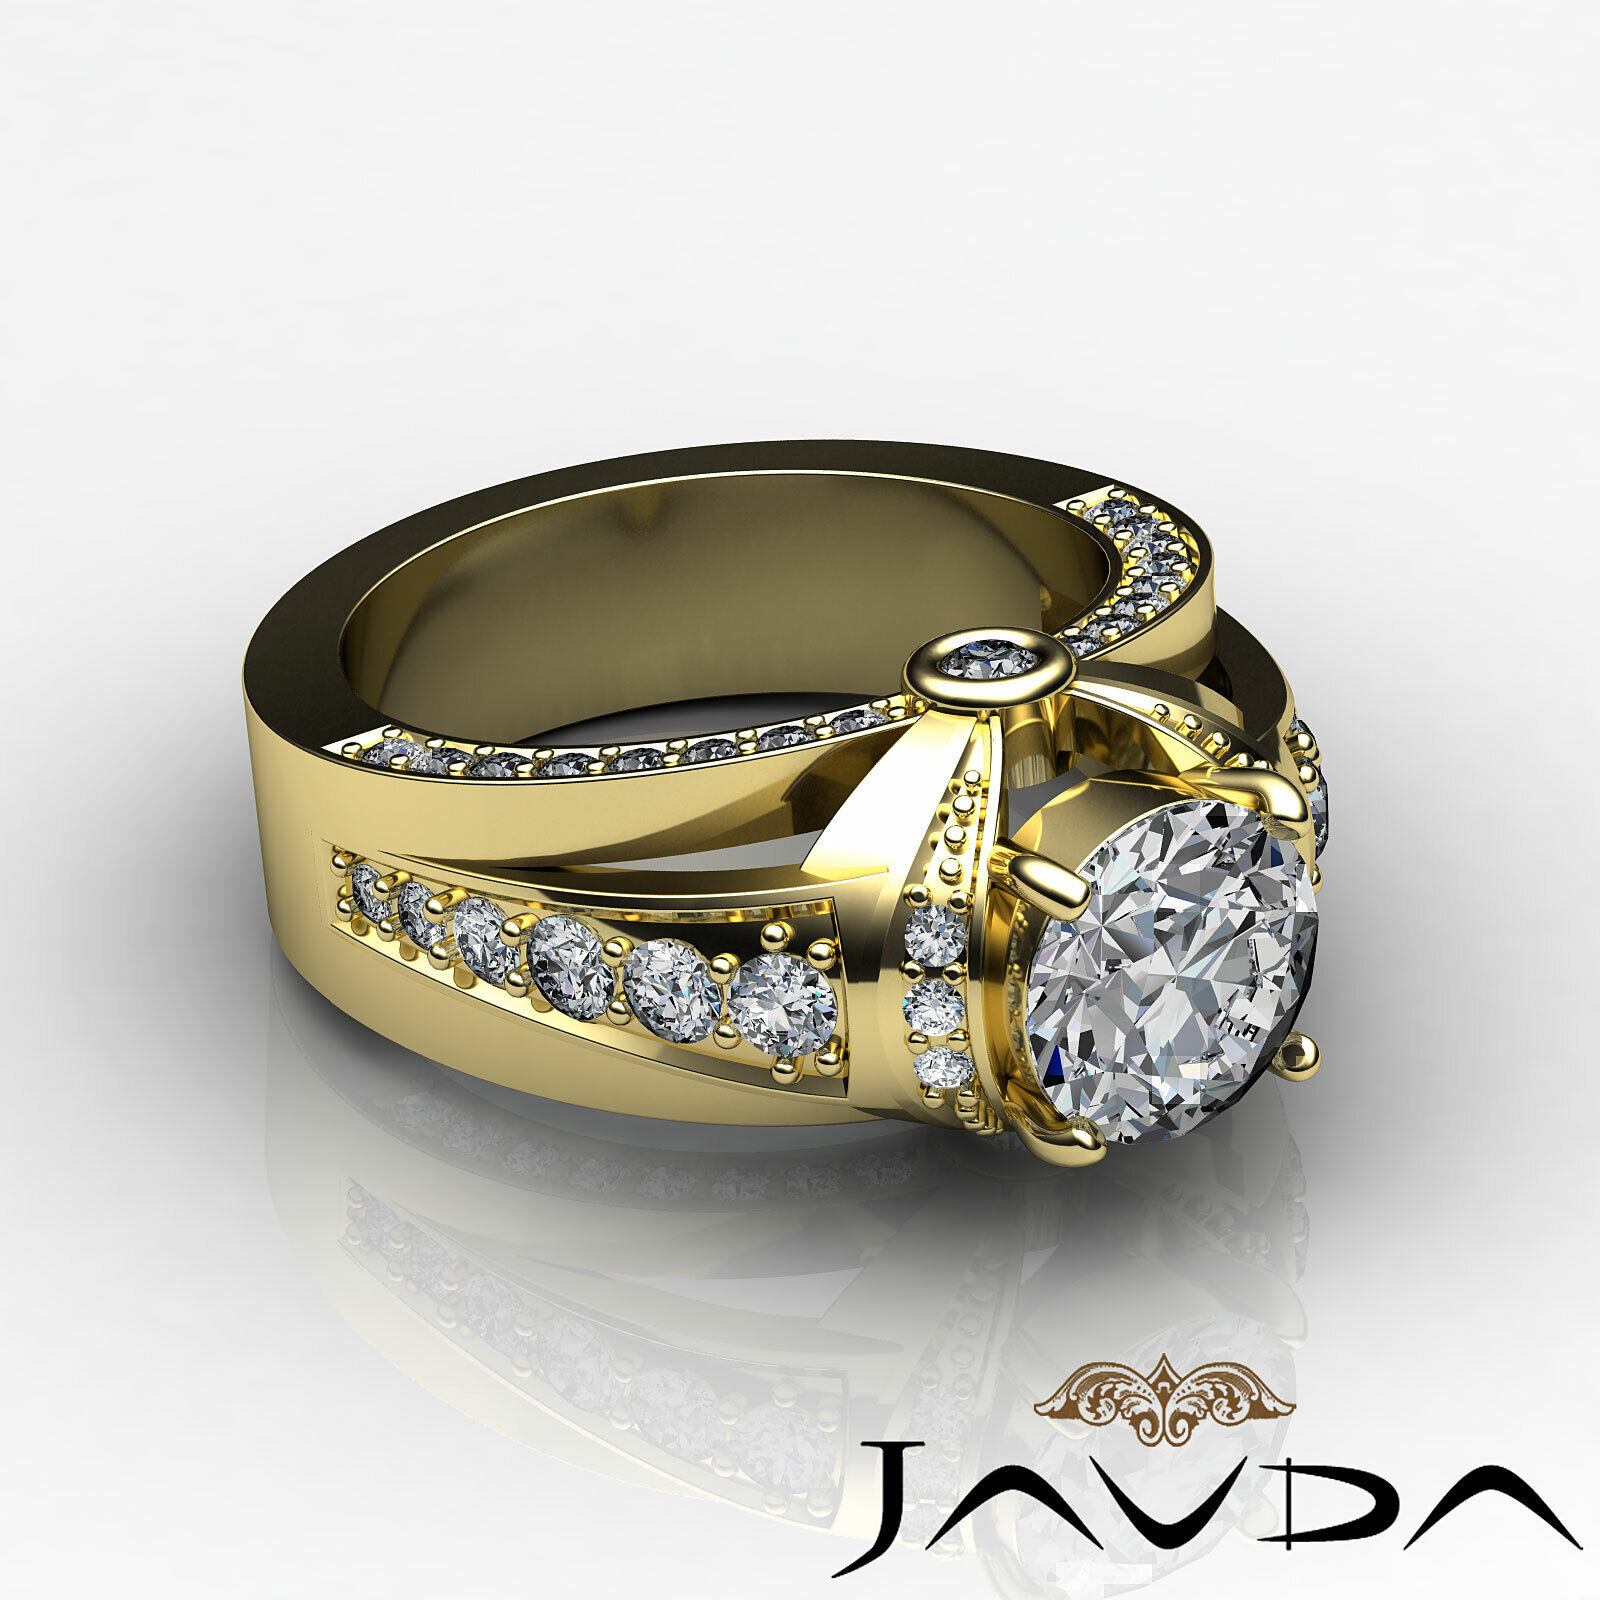 1.7ct Knot Classic Sidestone Round Diamond Engagement Ring GIA H-VVS2 White Gold 9